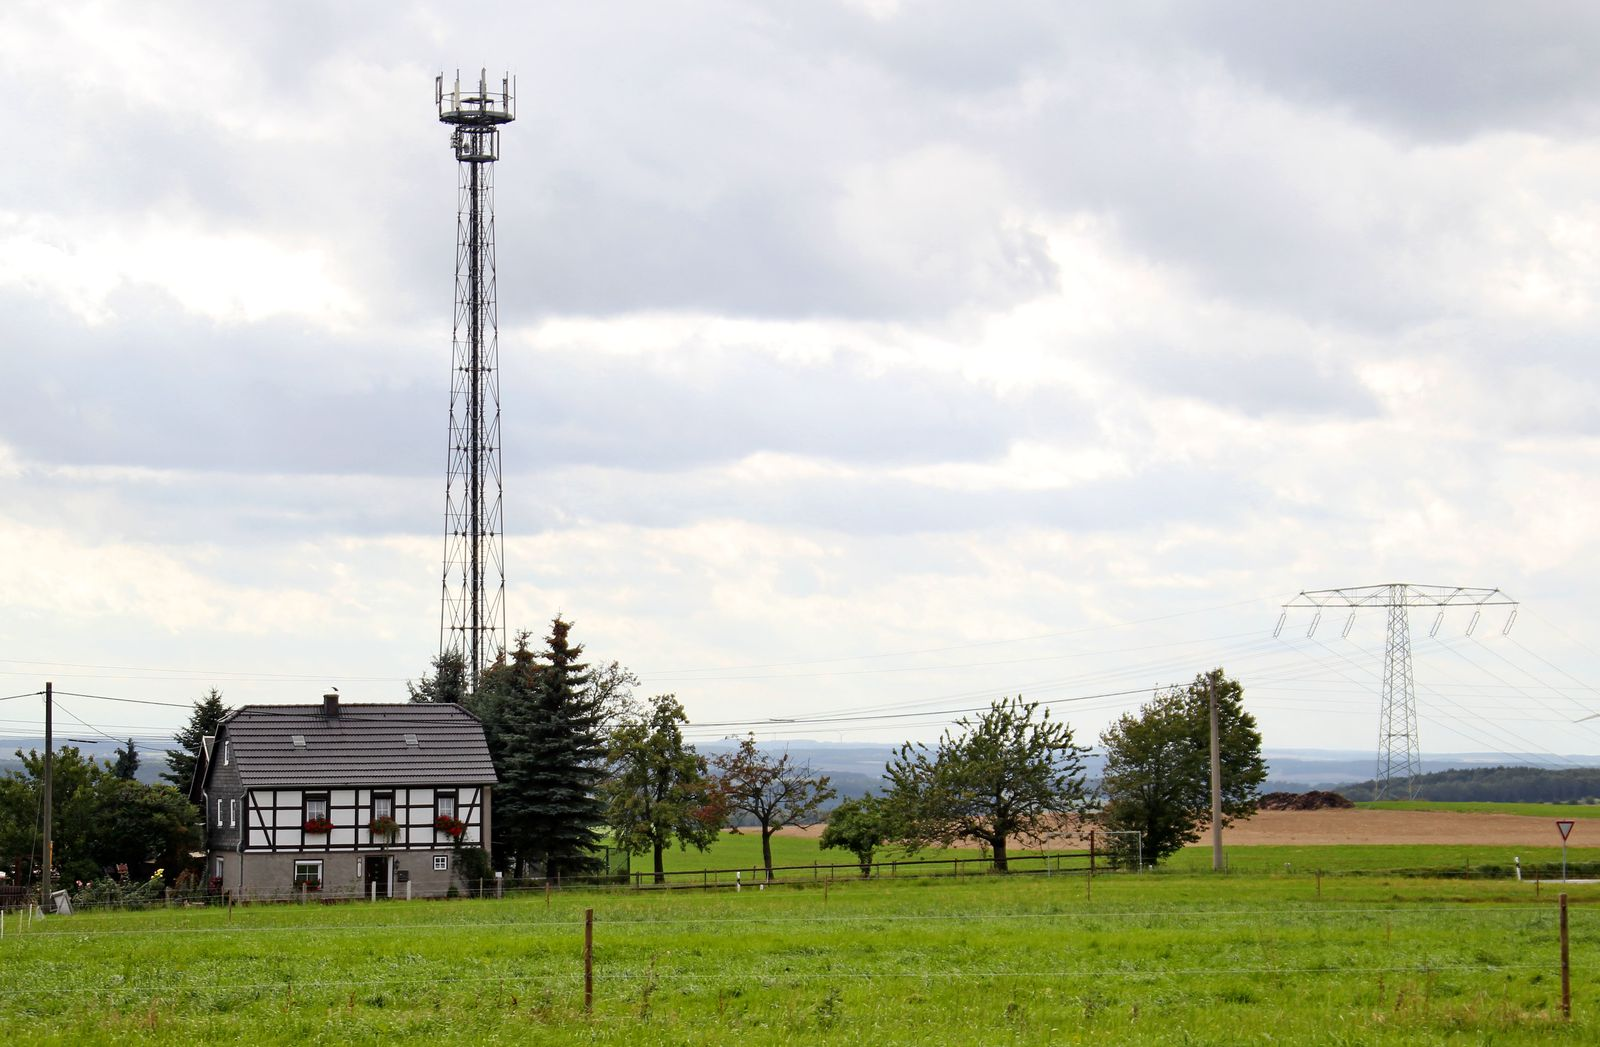 Mobilfunk auf dem Land